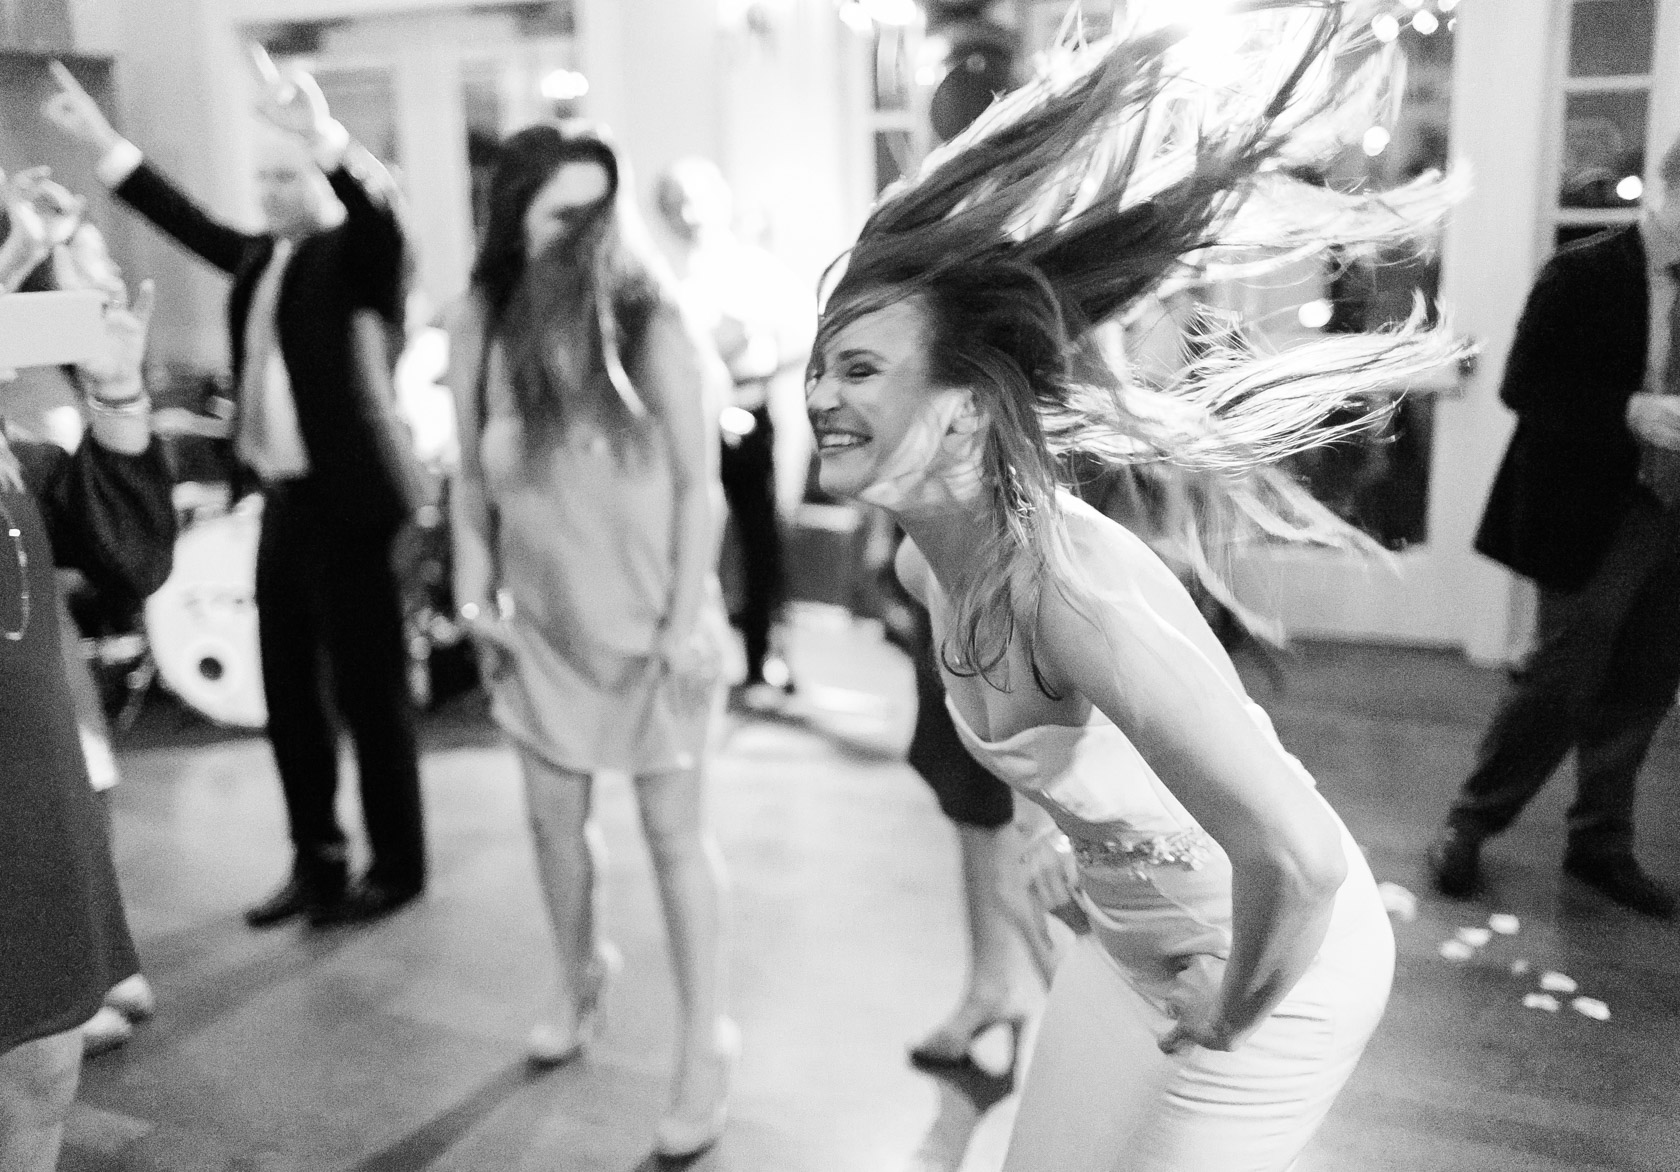 audubon clubhouse bride having fun on the dance floor